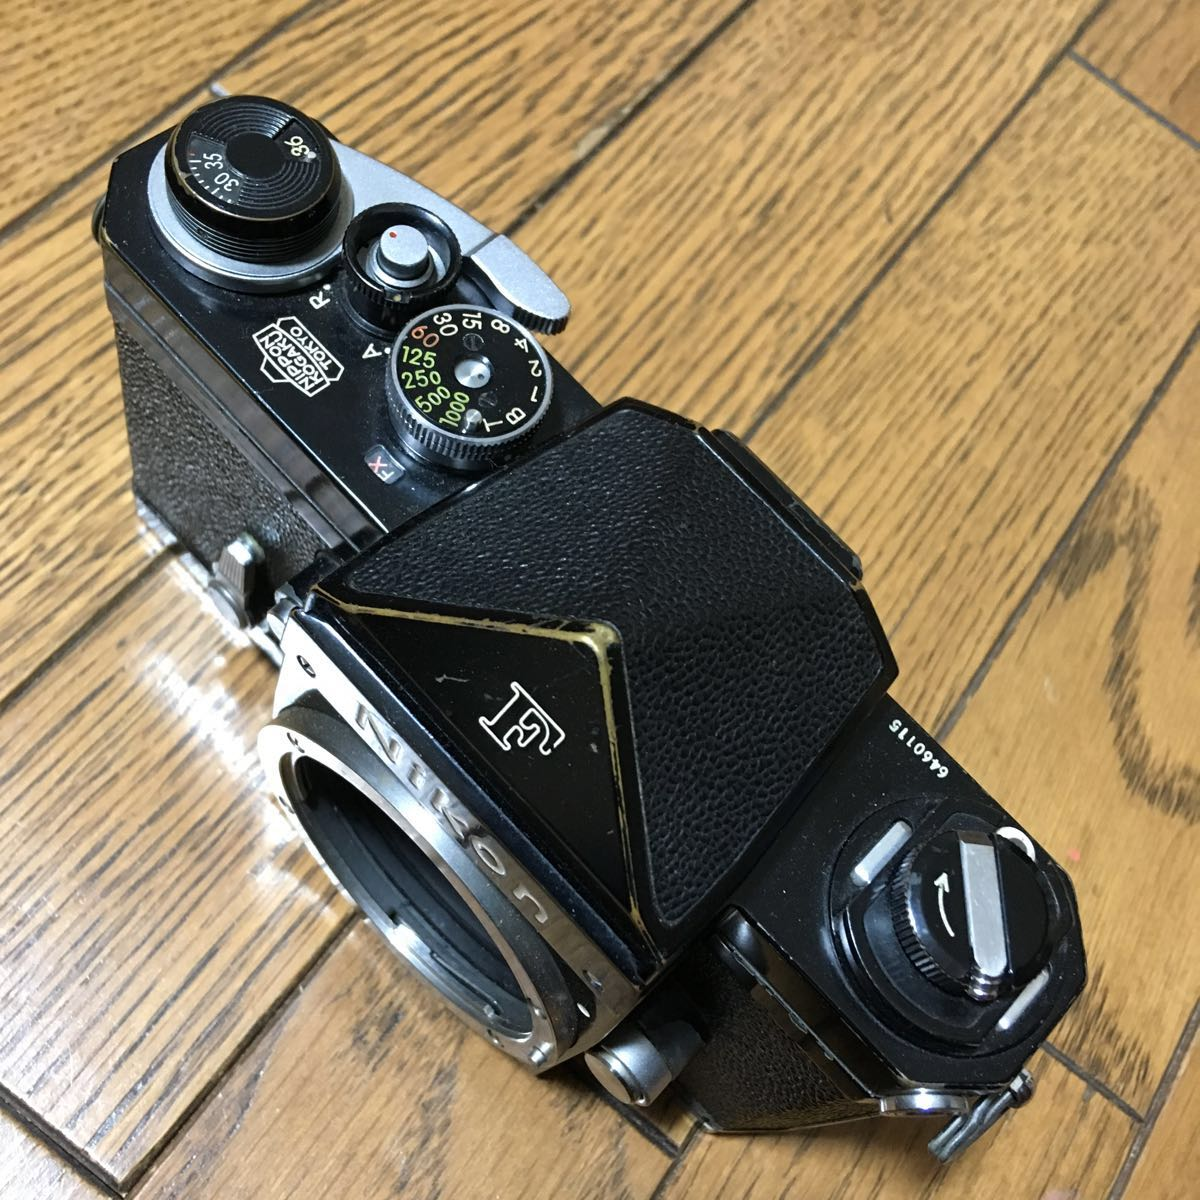 Nikon F アイレベル ブラック ボディ 646万台 前期型 動作確認済みです。_画像3